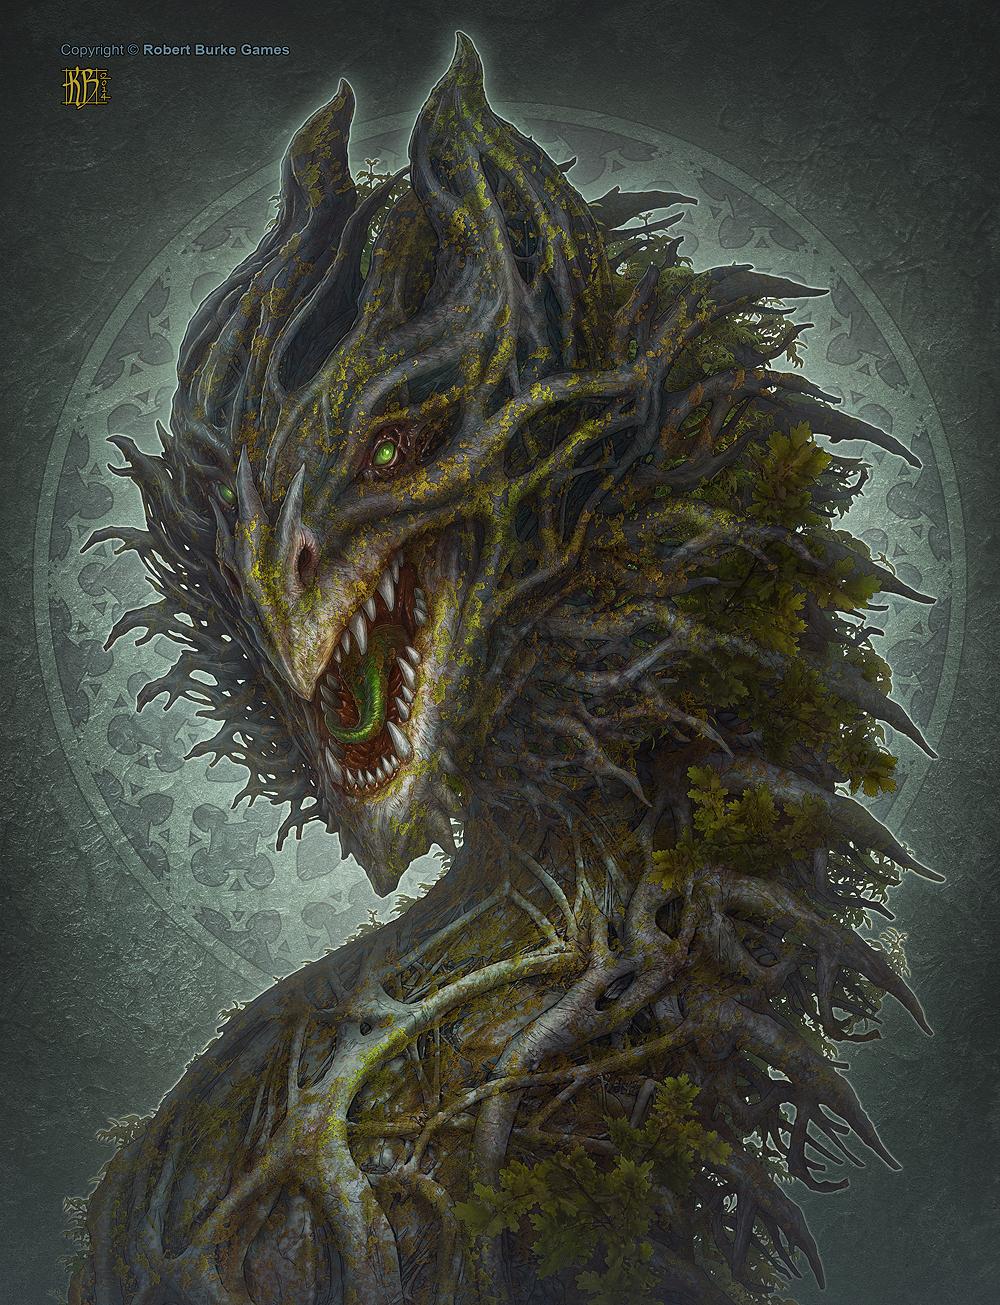 Kerembeyit forest dragon 1 b1b92a38 e4de